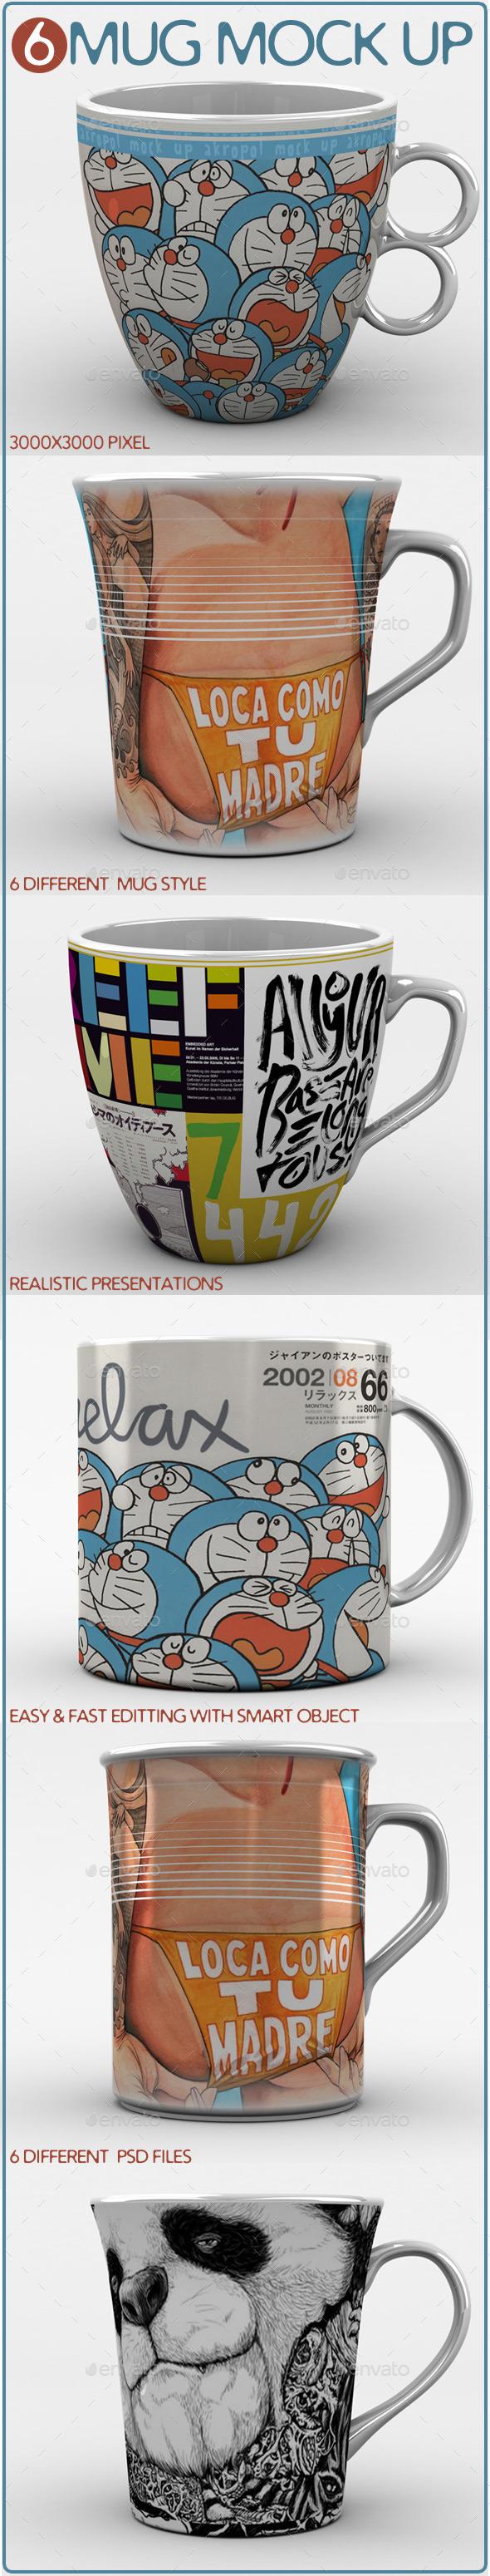 GraphicRiver Mug Mock Ups 11393439